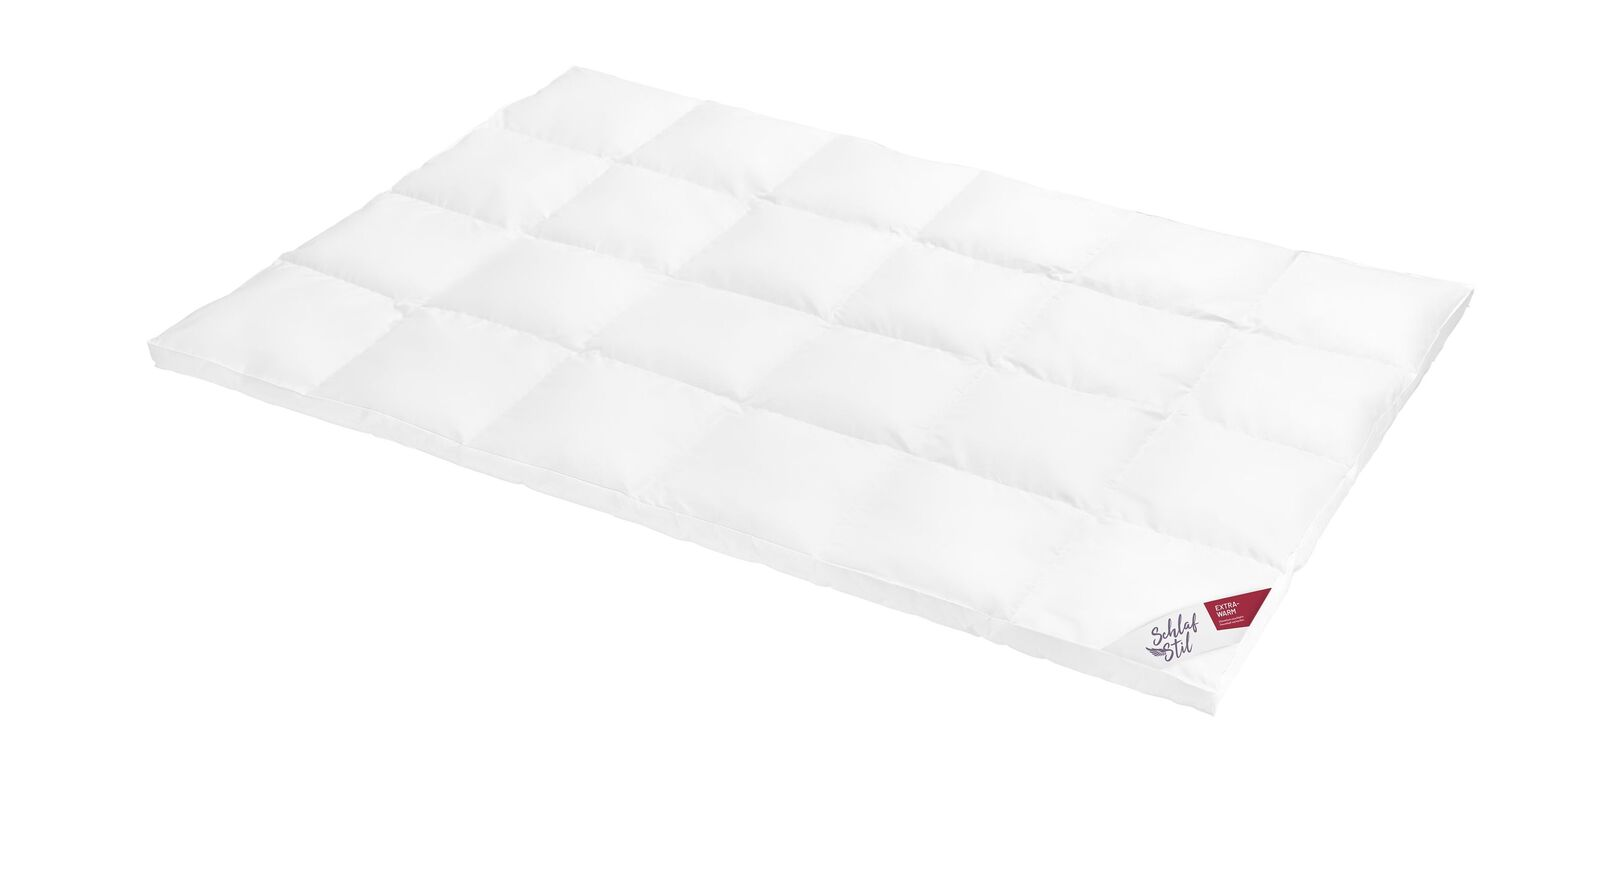 SCHLAFSTIL Daunen-Bettdecke D500 extra warm mit Baumwollbezug